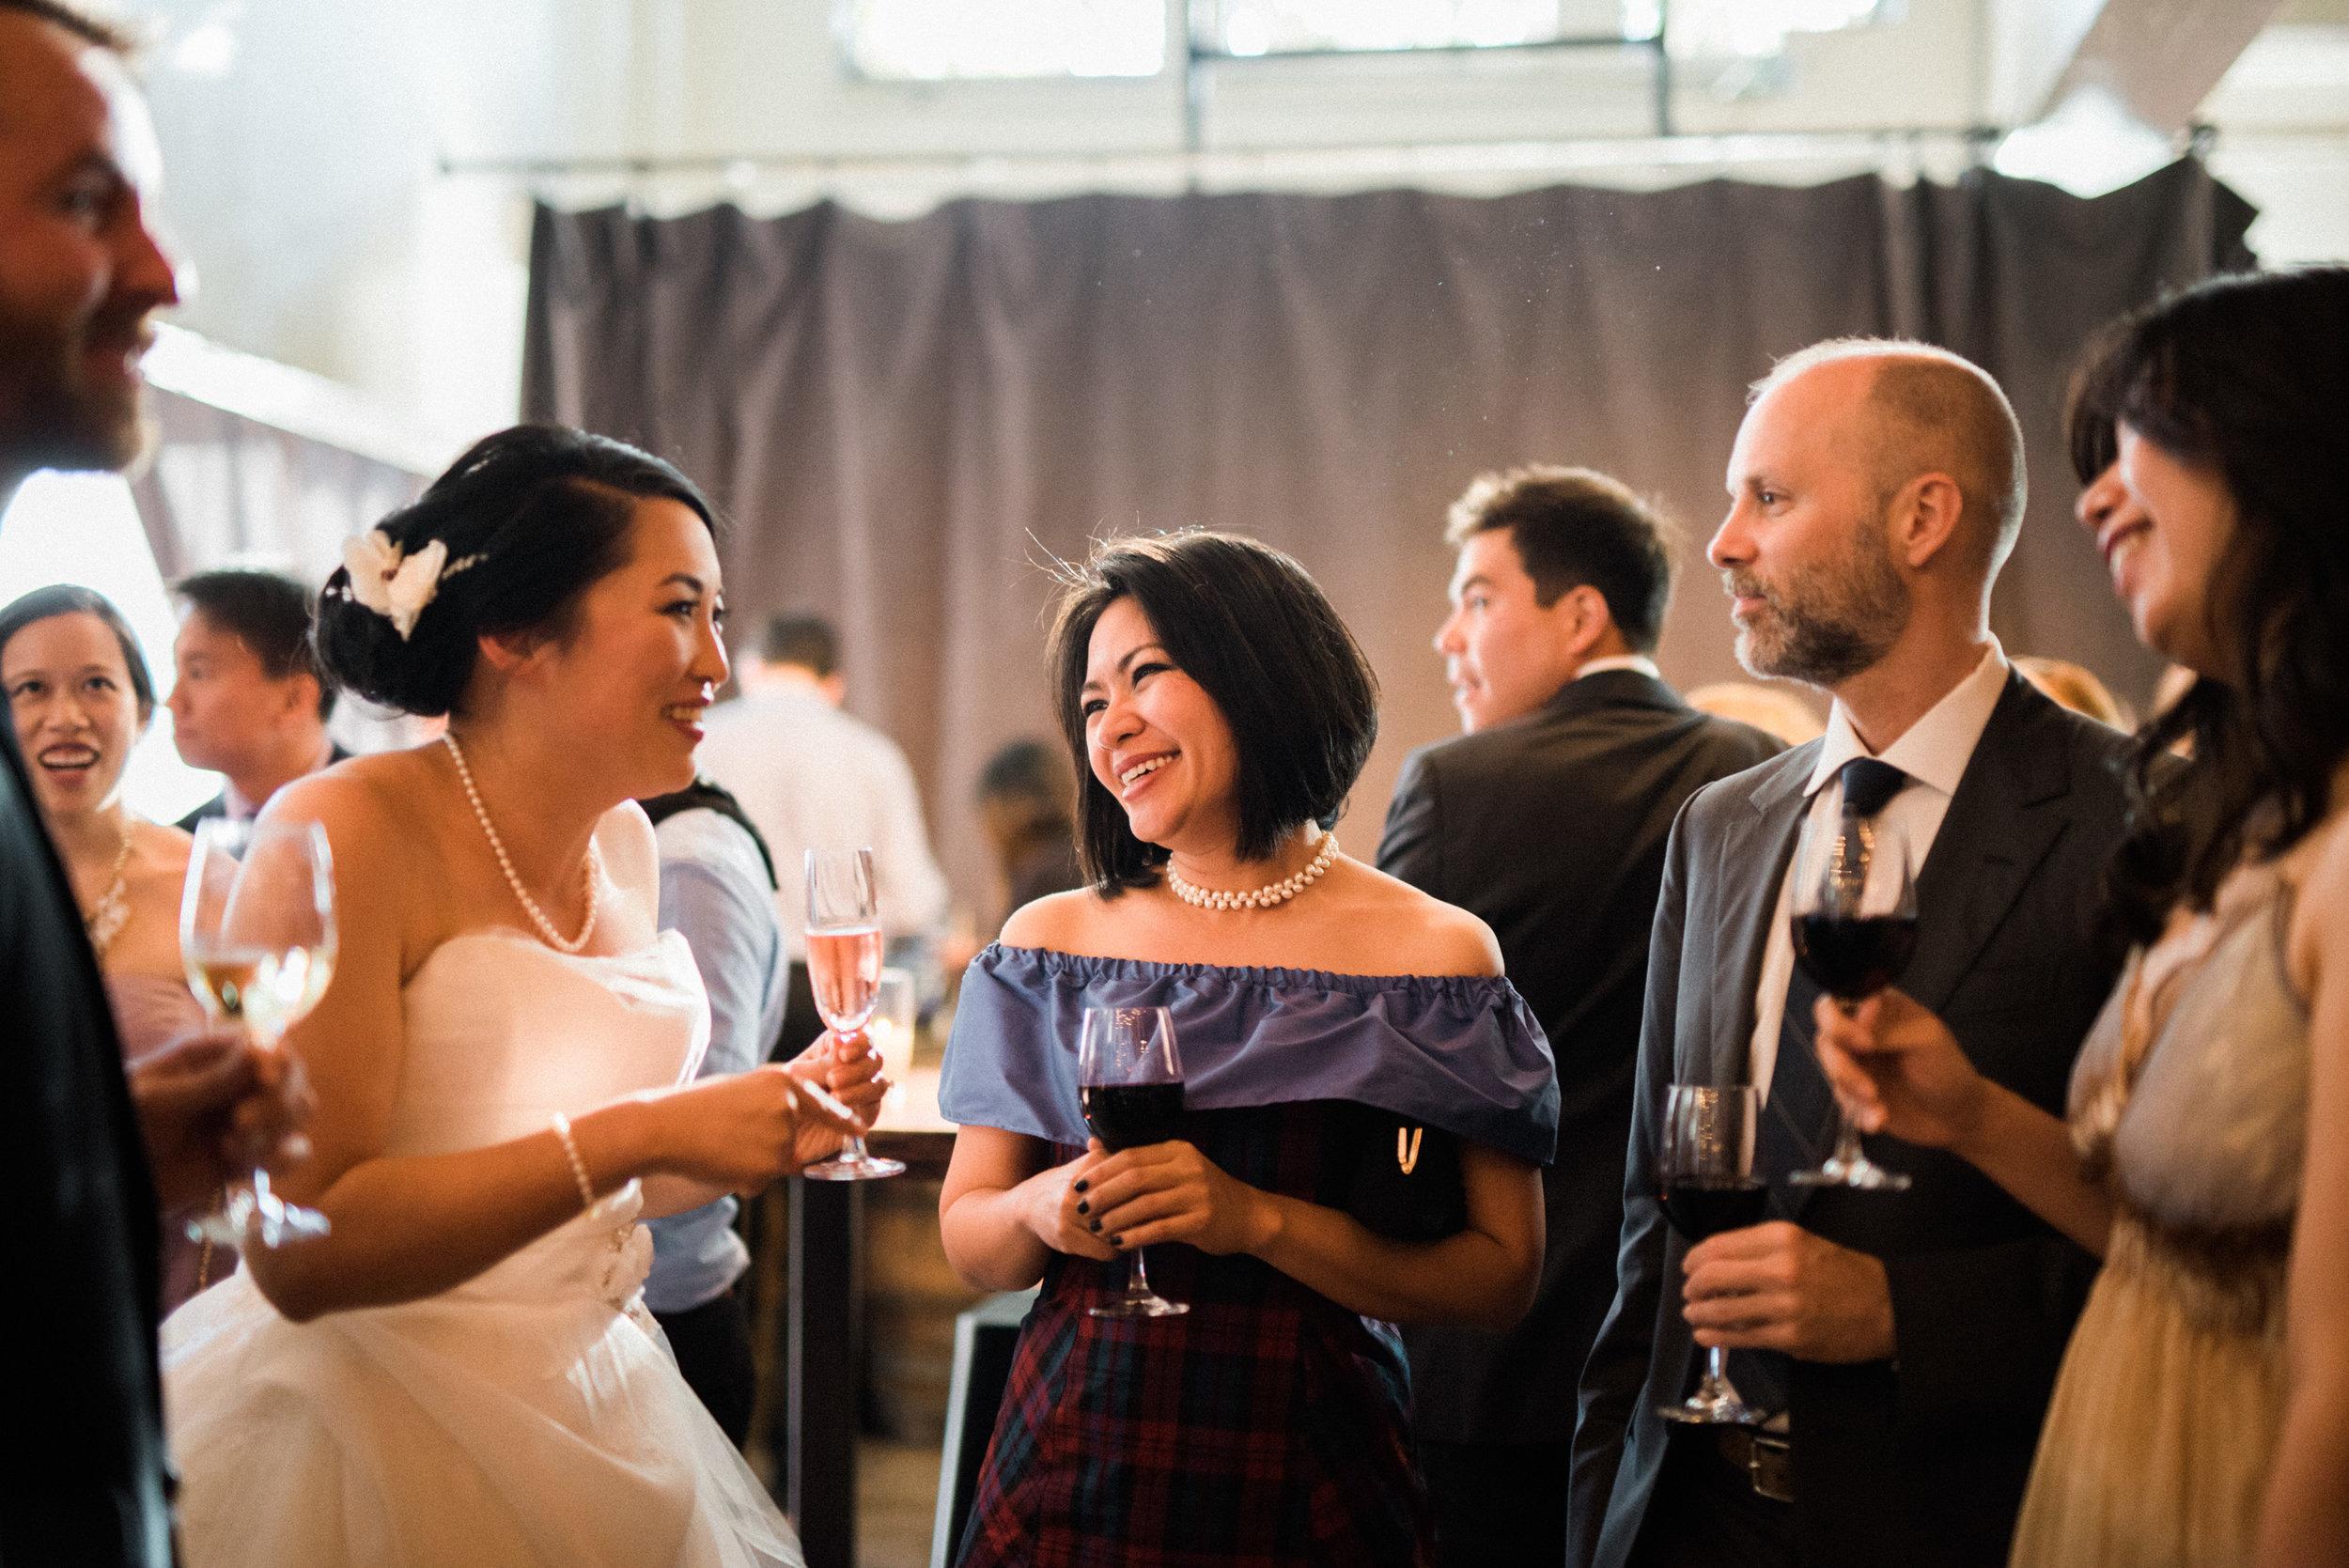 Swedenborgian Church Dogpatch Winery Wedding062.jpg